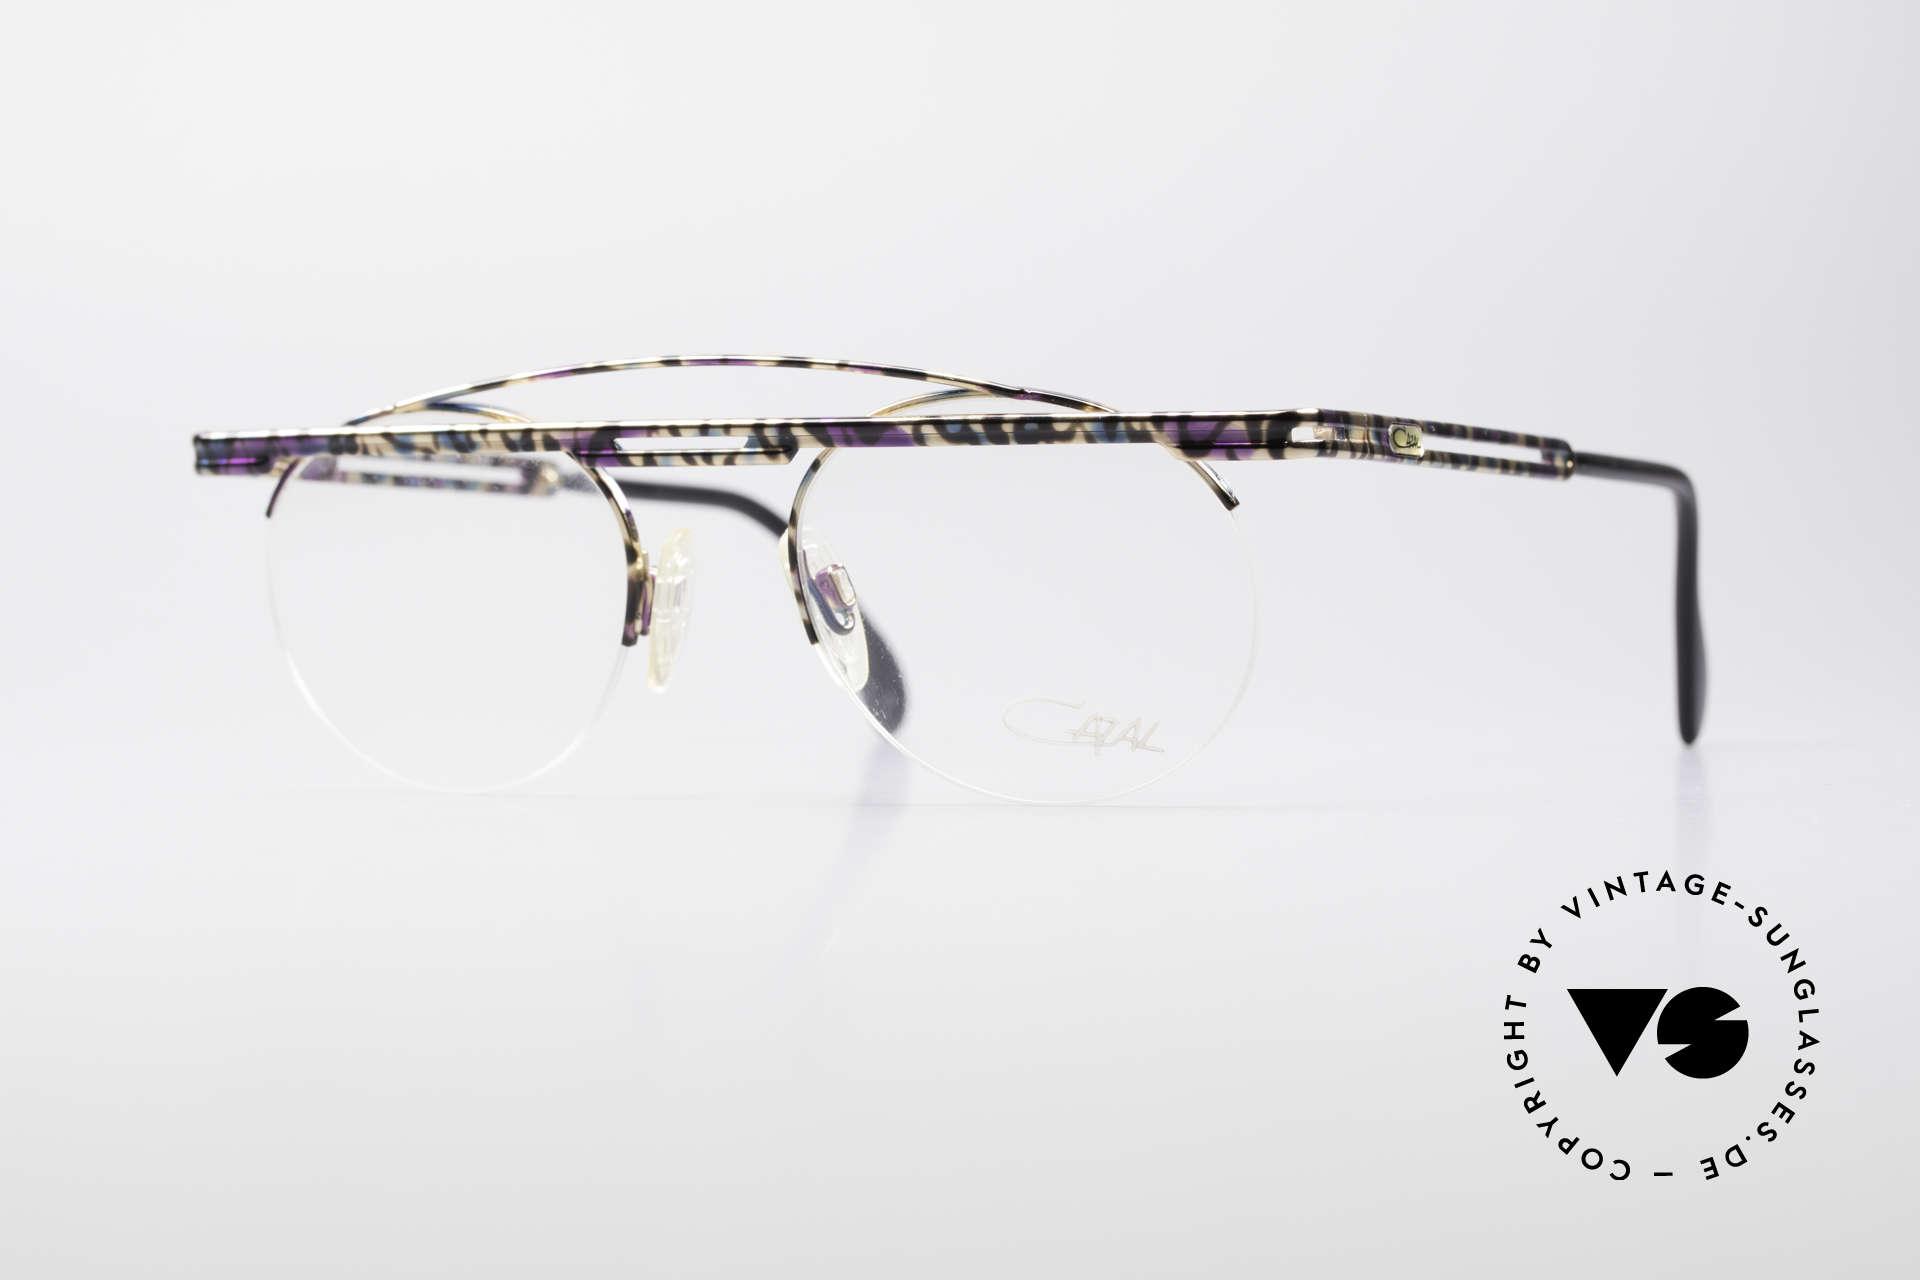 Cazal 748 Crazy Vintage No Retro Frame, interesting Cazal vintage eyeglasses-frame from 1997/98, Made for Men and Women